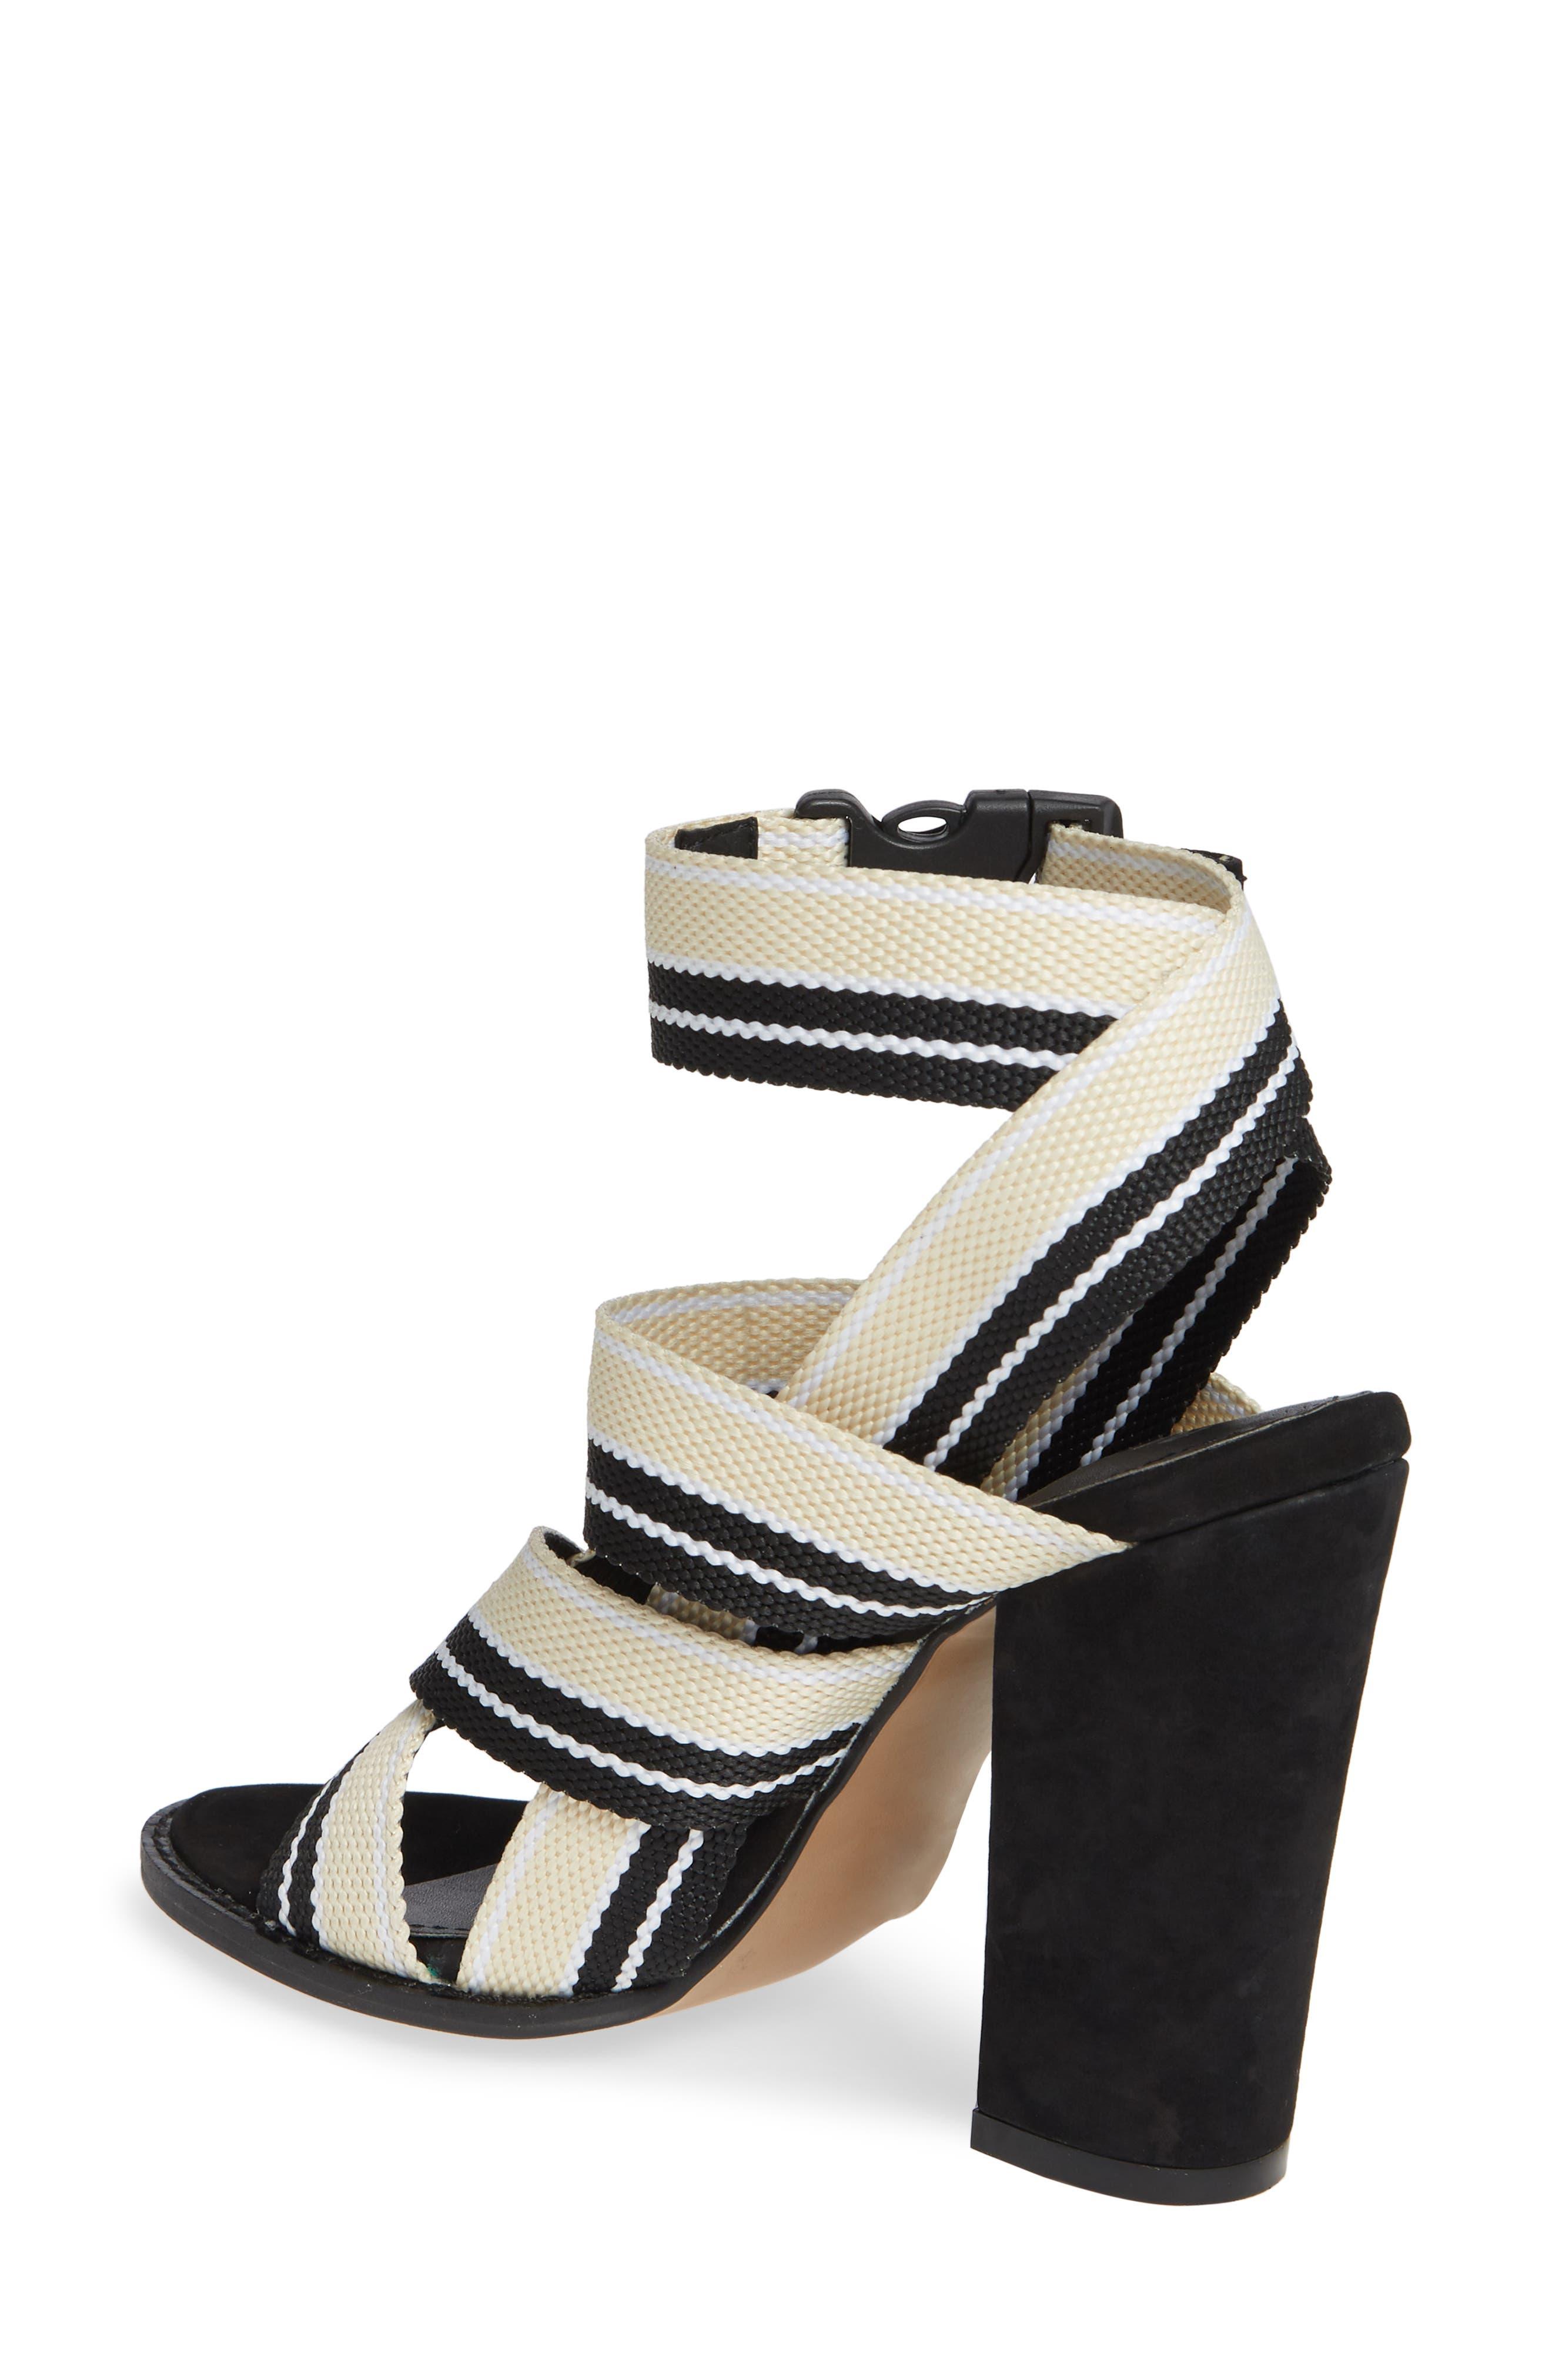 ALIAS MAE, Woven Strappy Sandal, Alternate thumbnail 2, color, NUDE/ BLACK FABRIC